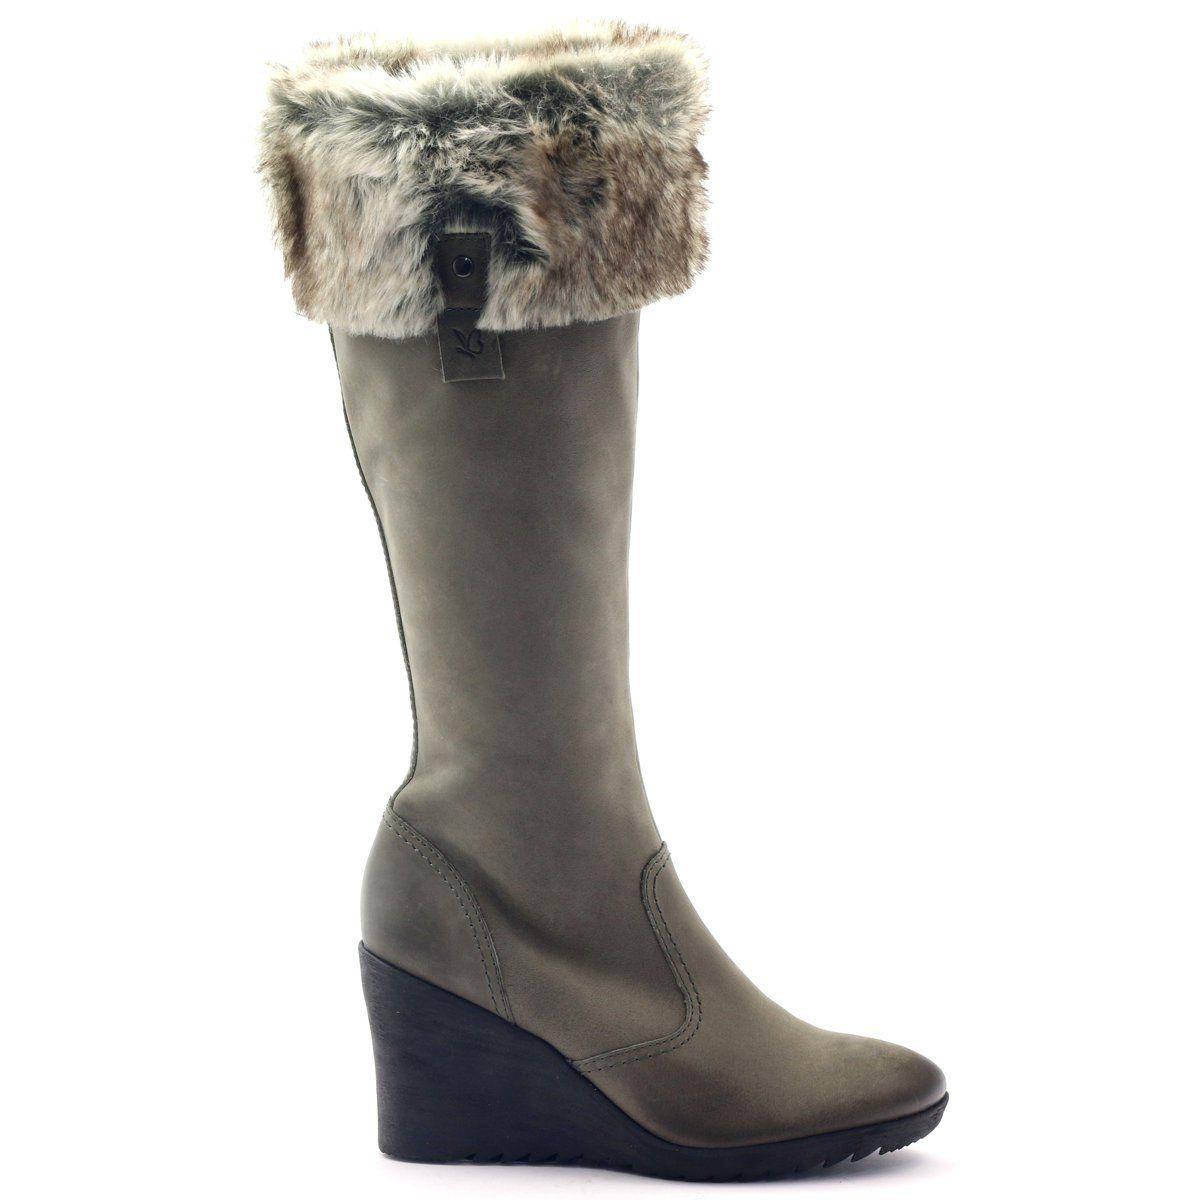 Caprice Kozaki Buty Damskie Skorzane 25607 Szare Womens Boots Boots Leather Women